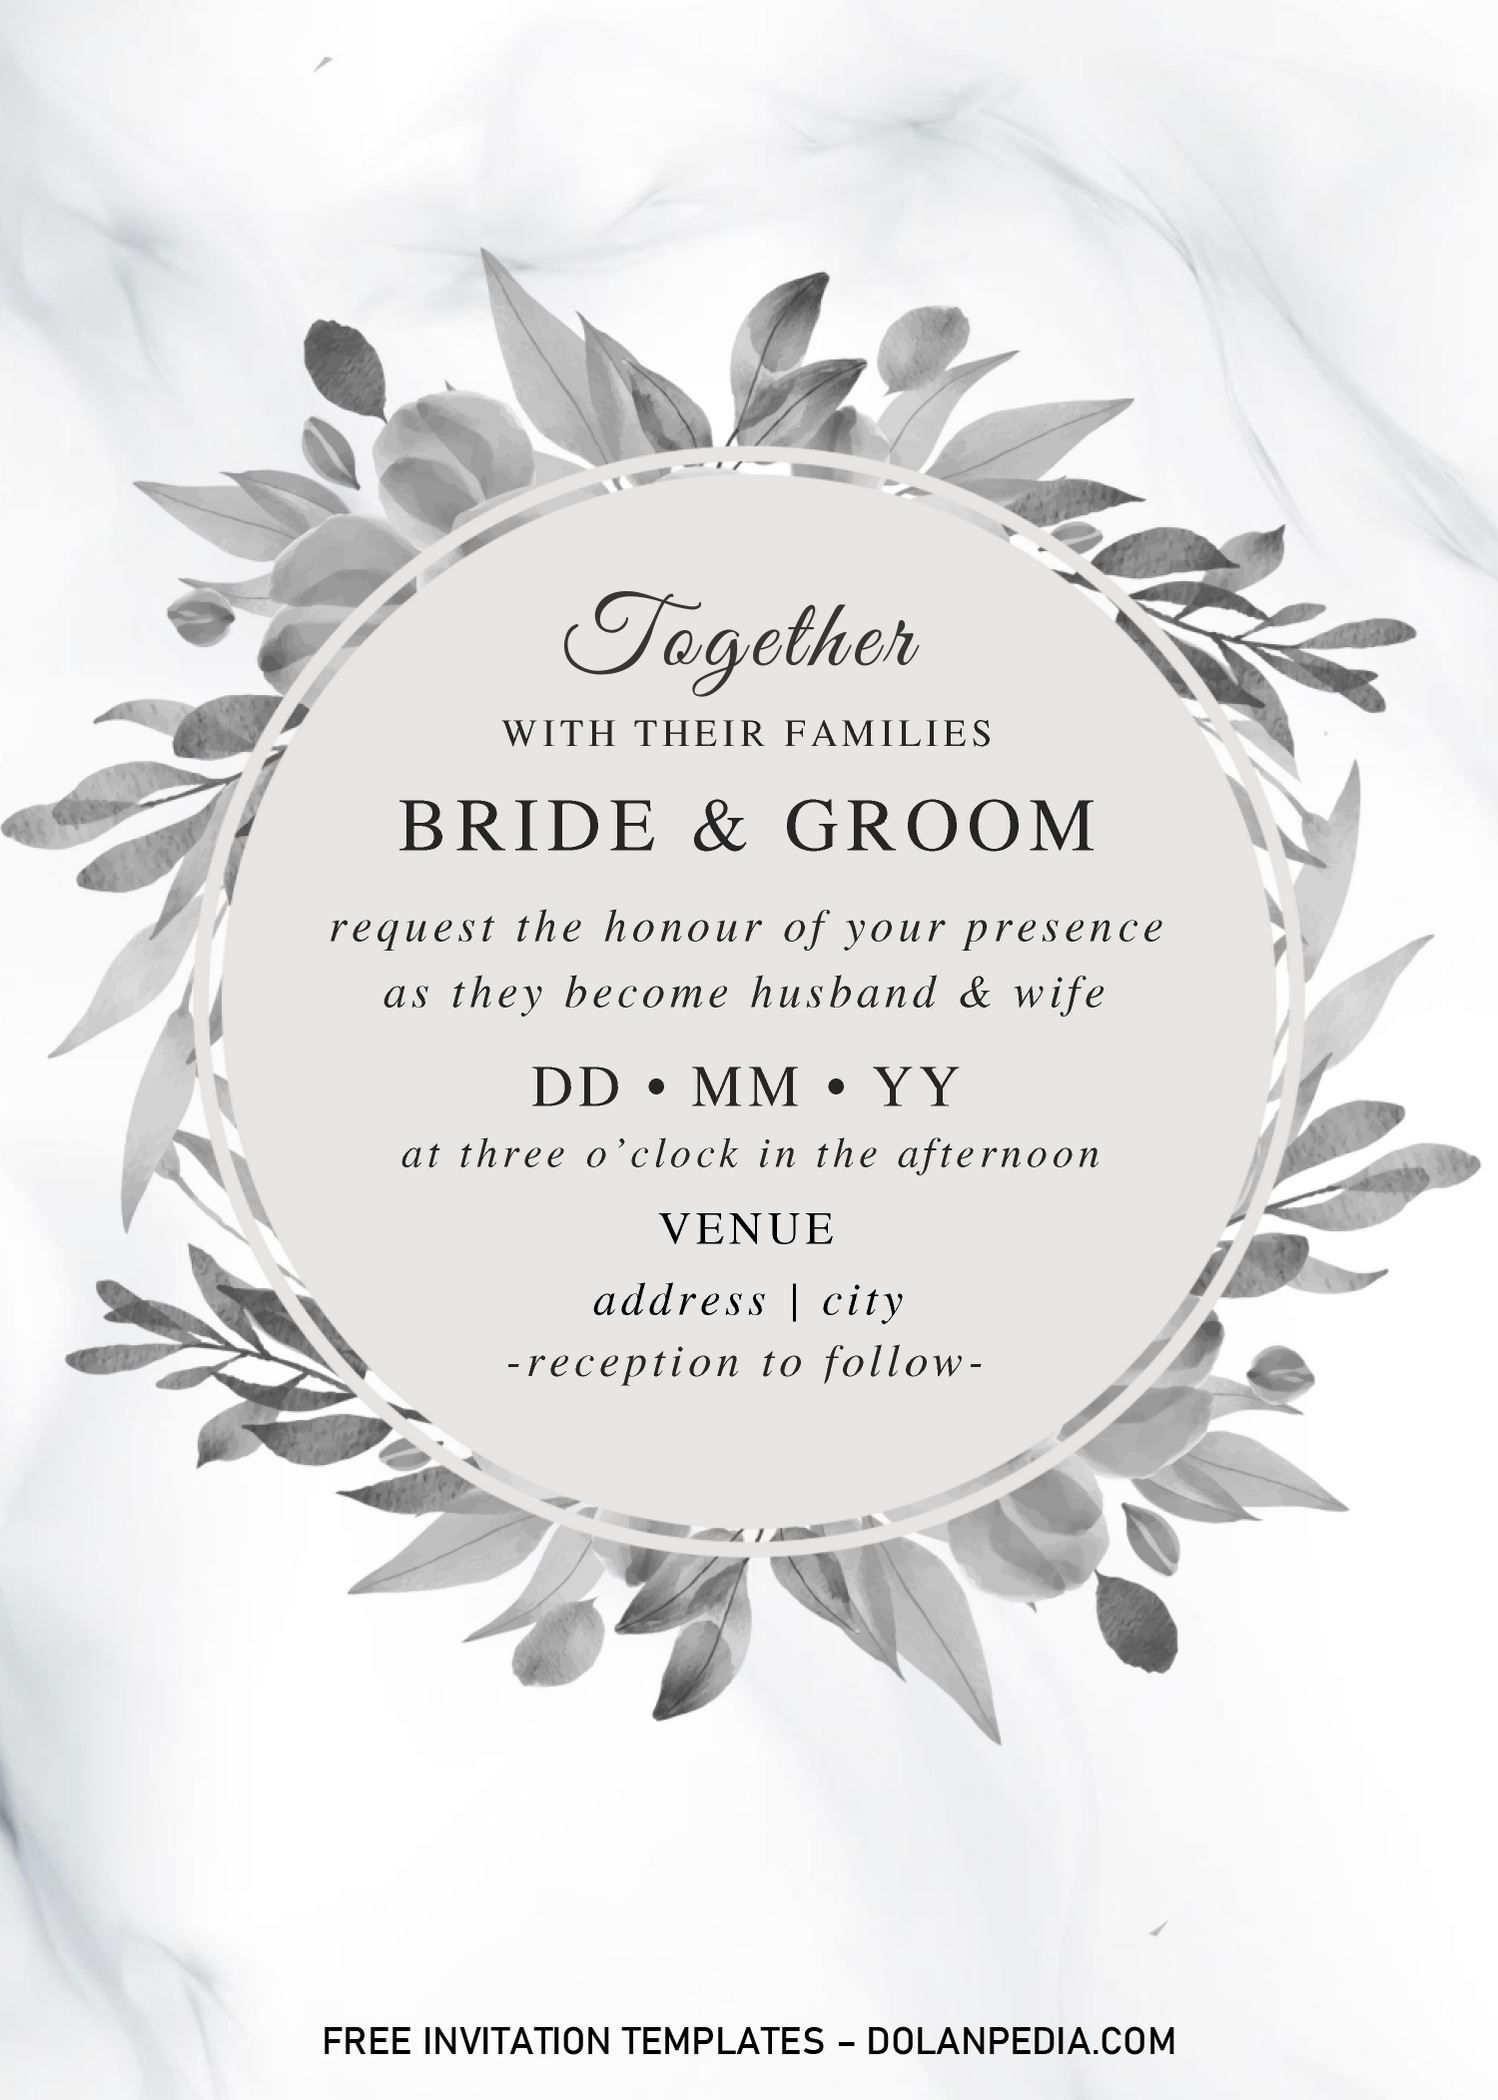 Black And White Wedding Invitation Templates Editable With Ms Word Black And White Wedding Invitations White Wedding Invitations Wedding Invitation Templates